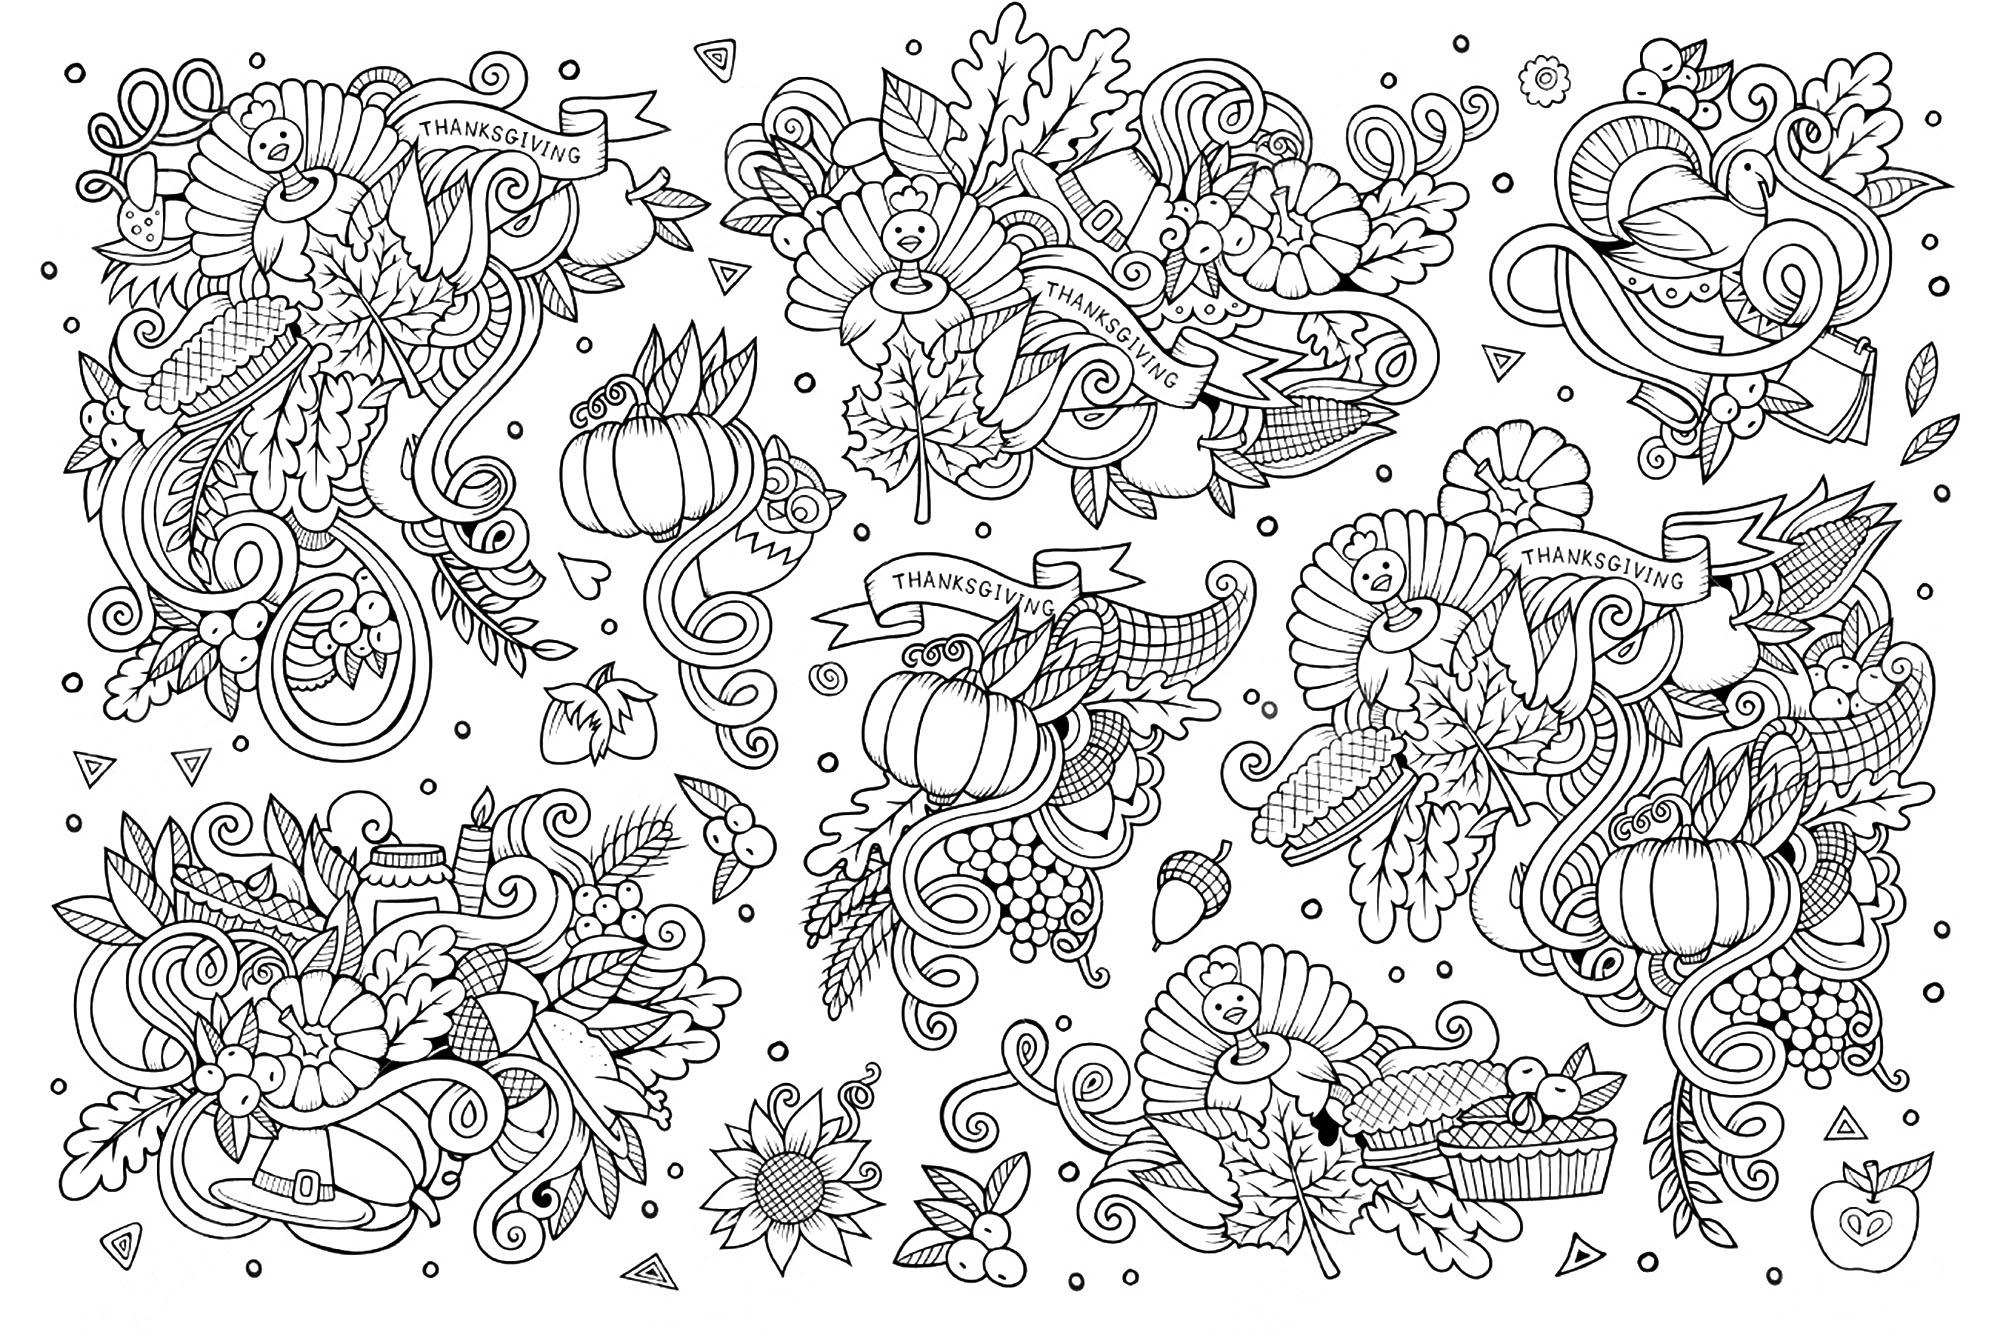 Sketchy Vector Hand Drawn Doodle Cartoon Set Of